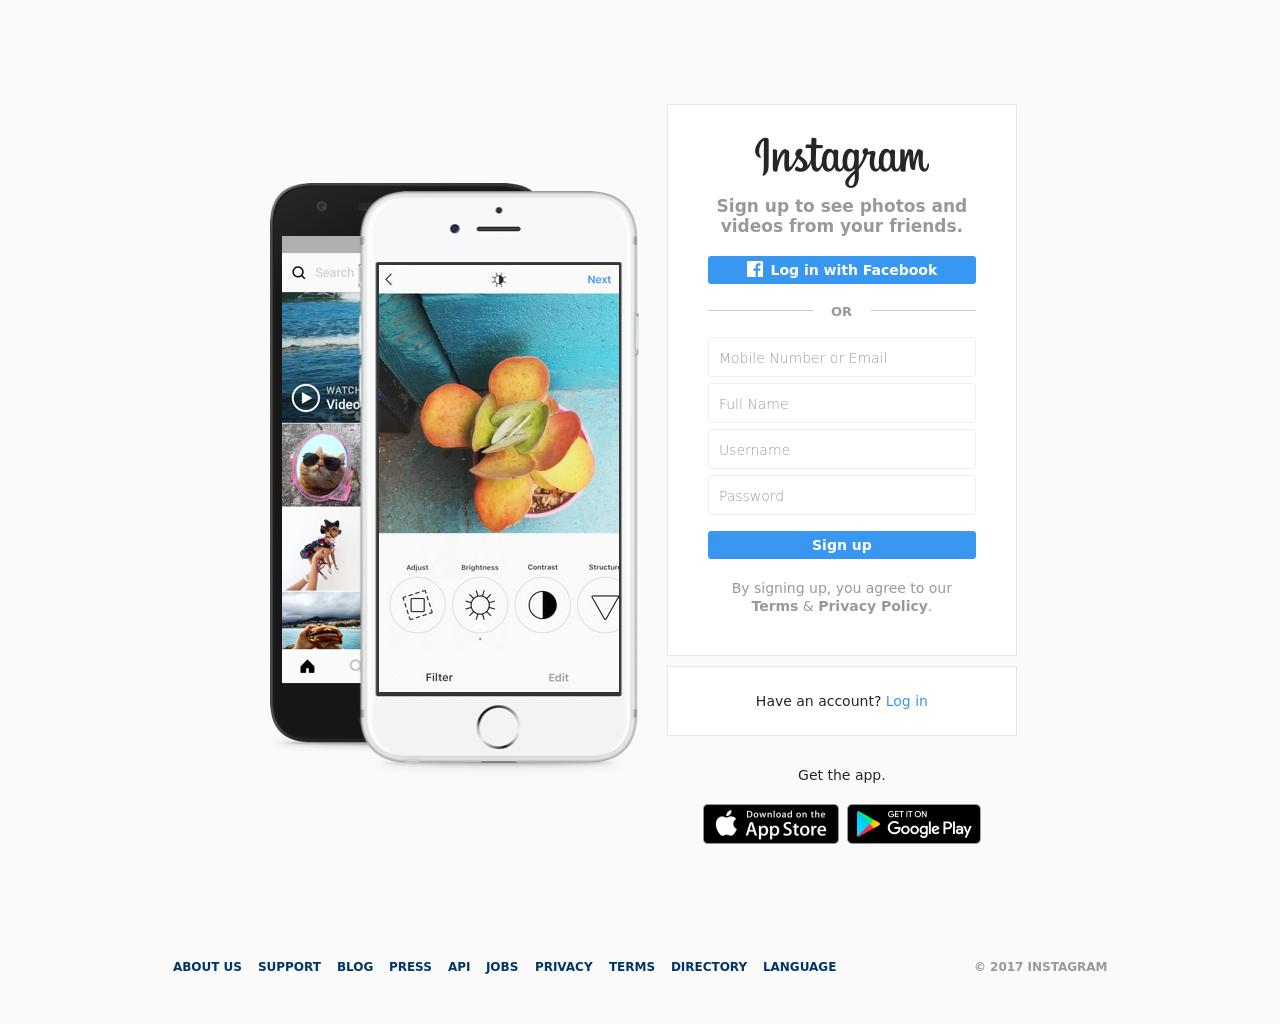 Instagram-Advertising-Reviews-Pricing